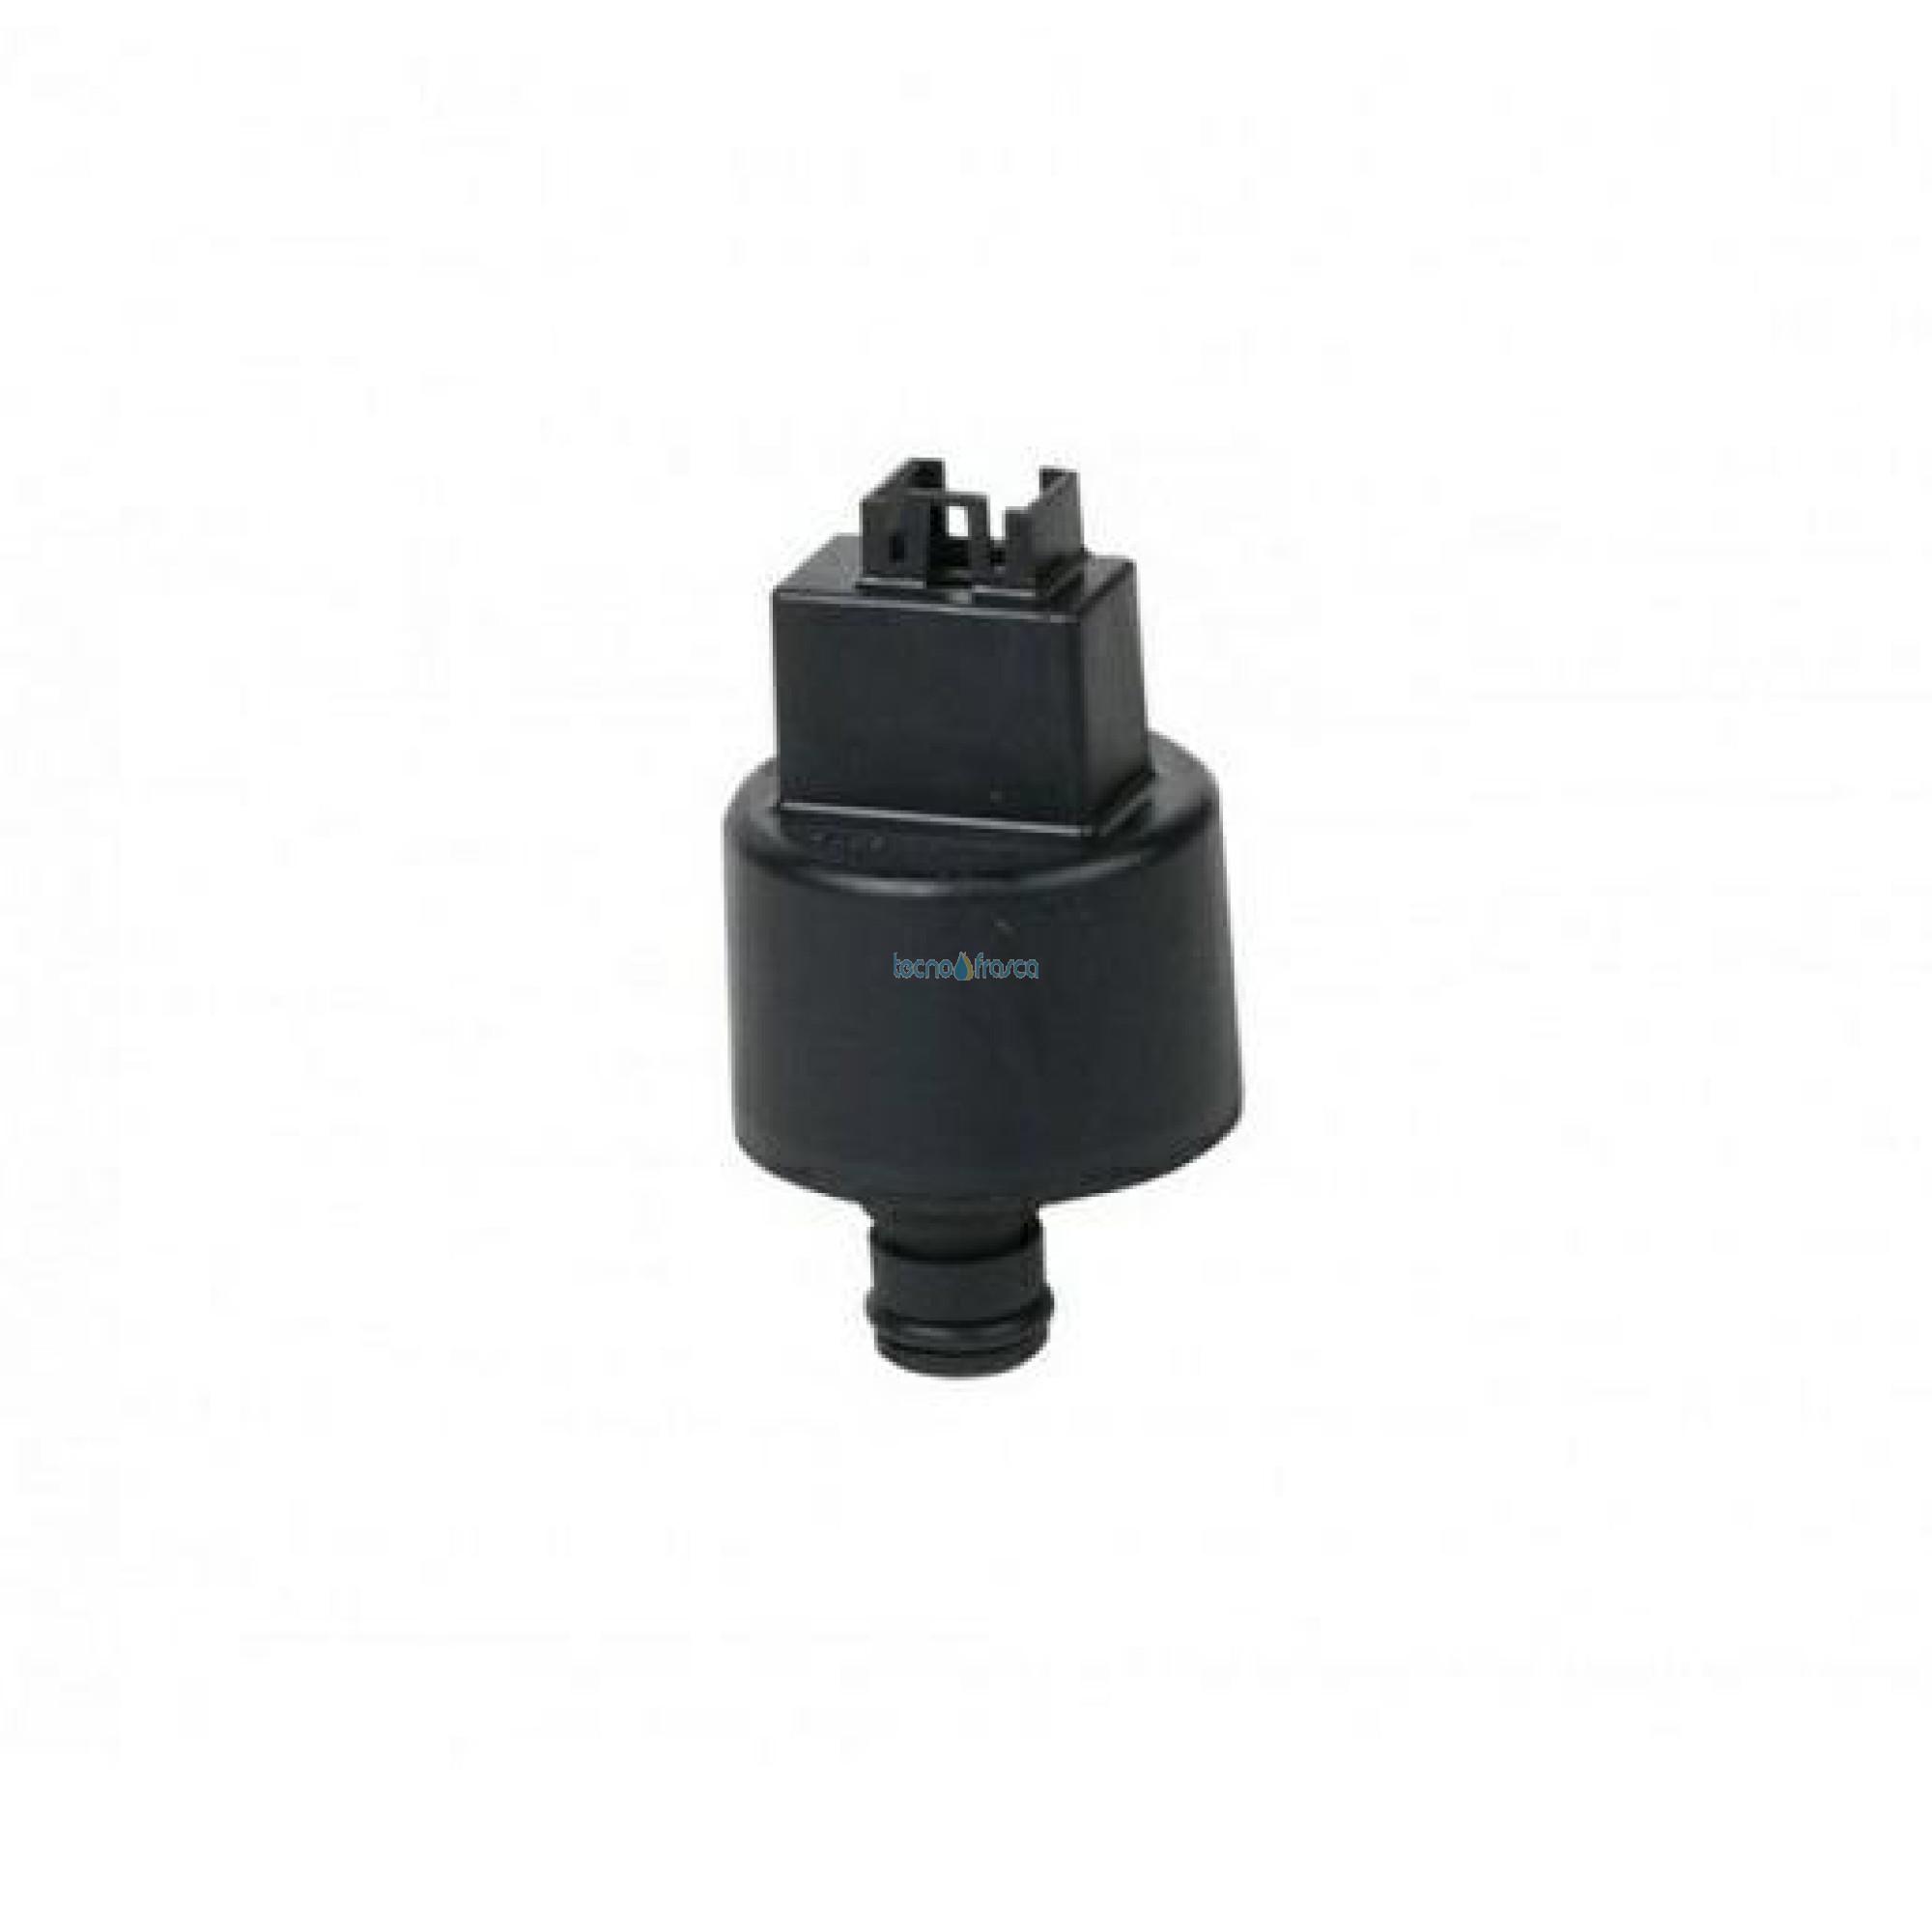 Beretta trasduttore di pressione meteo exclusive r10028142